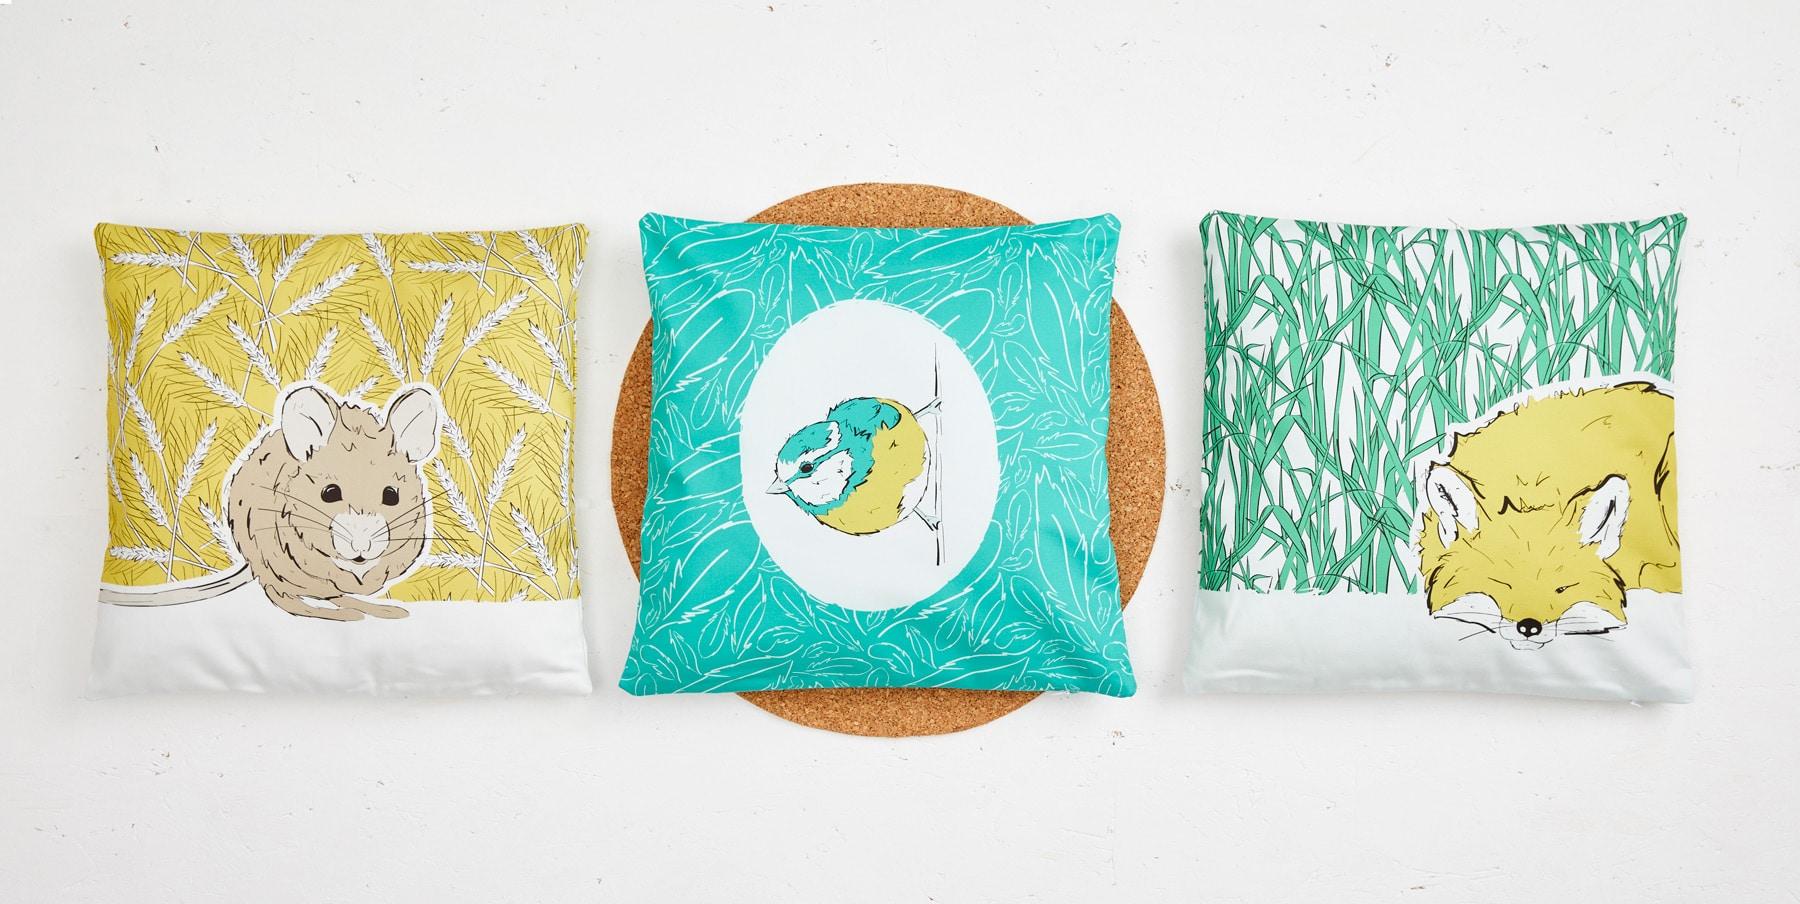 Roo-tid Cushion Covers